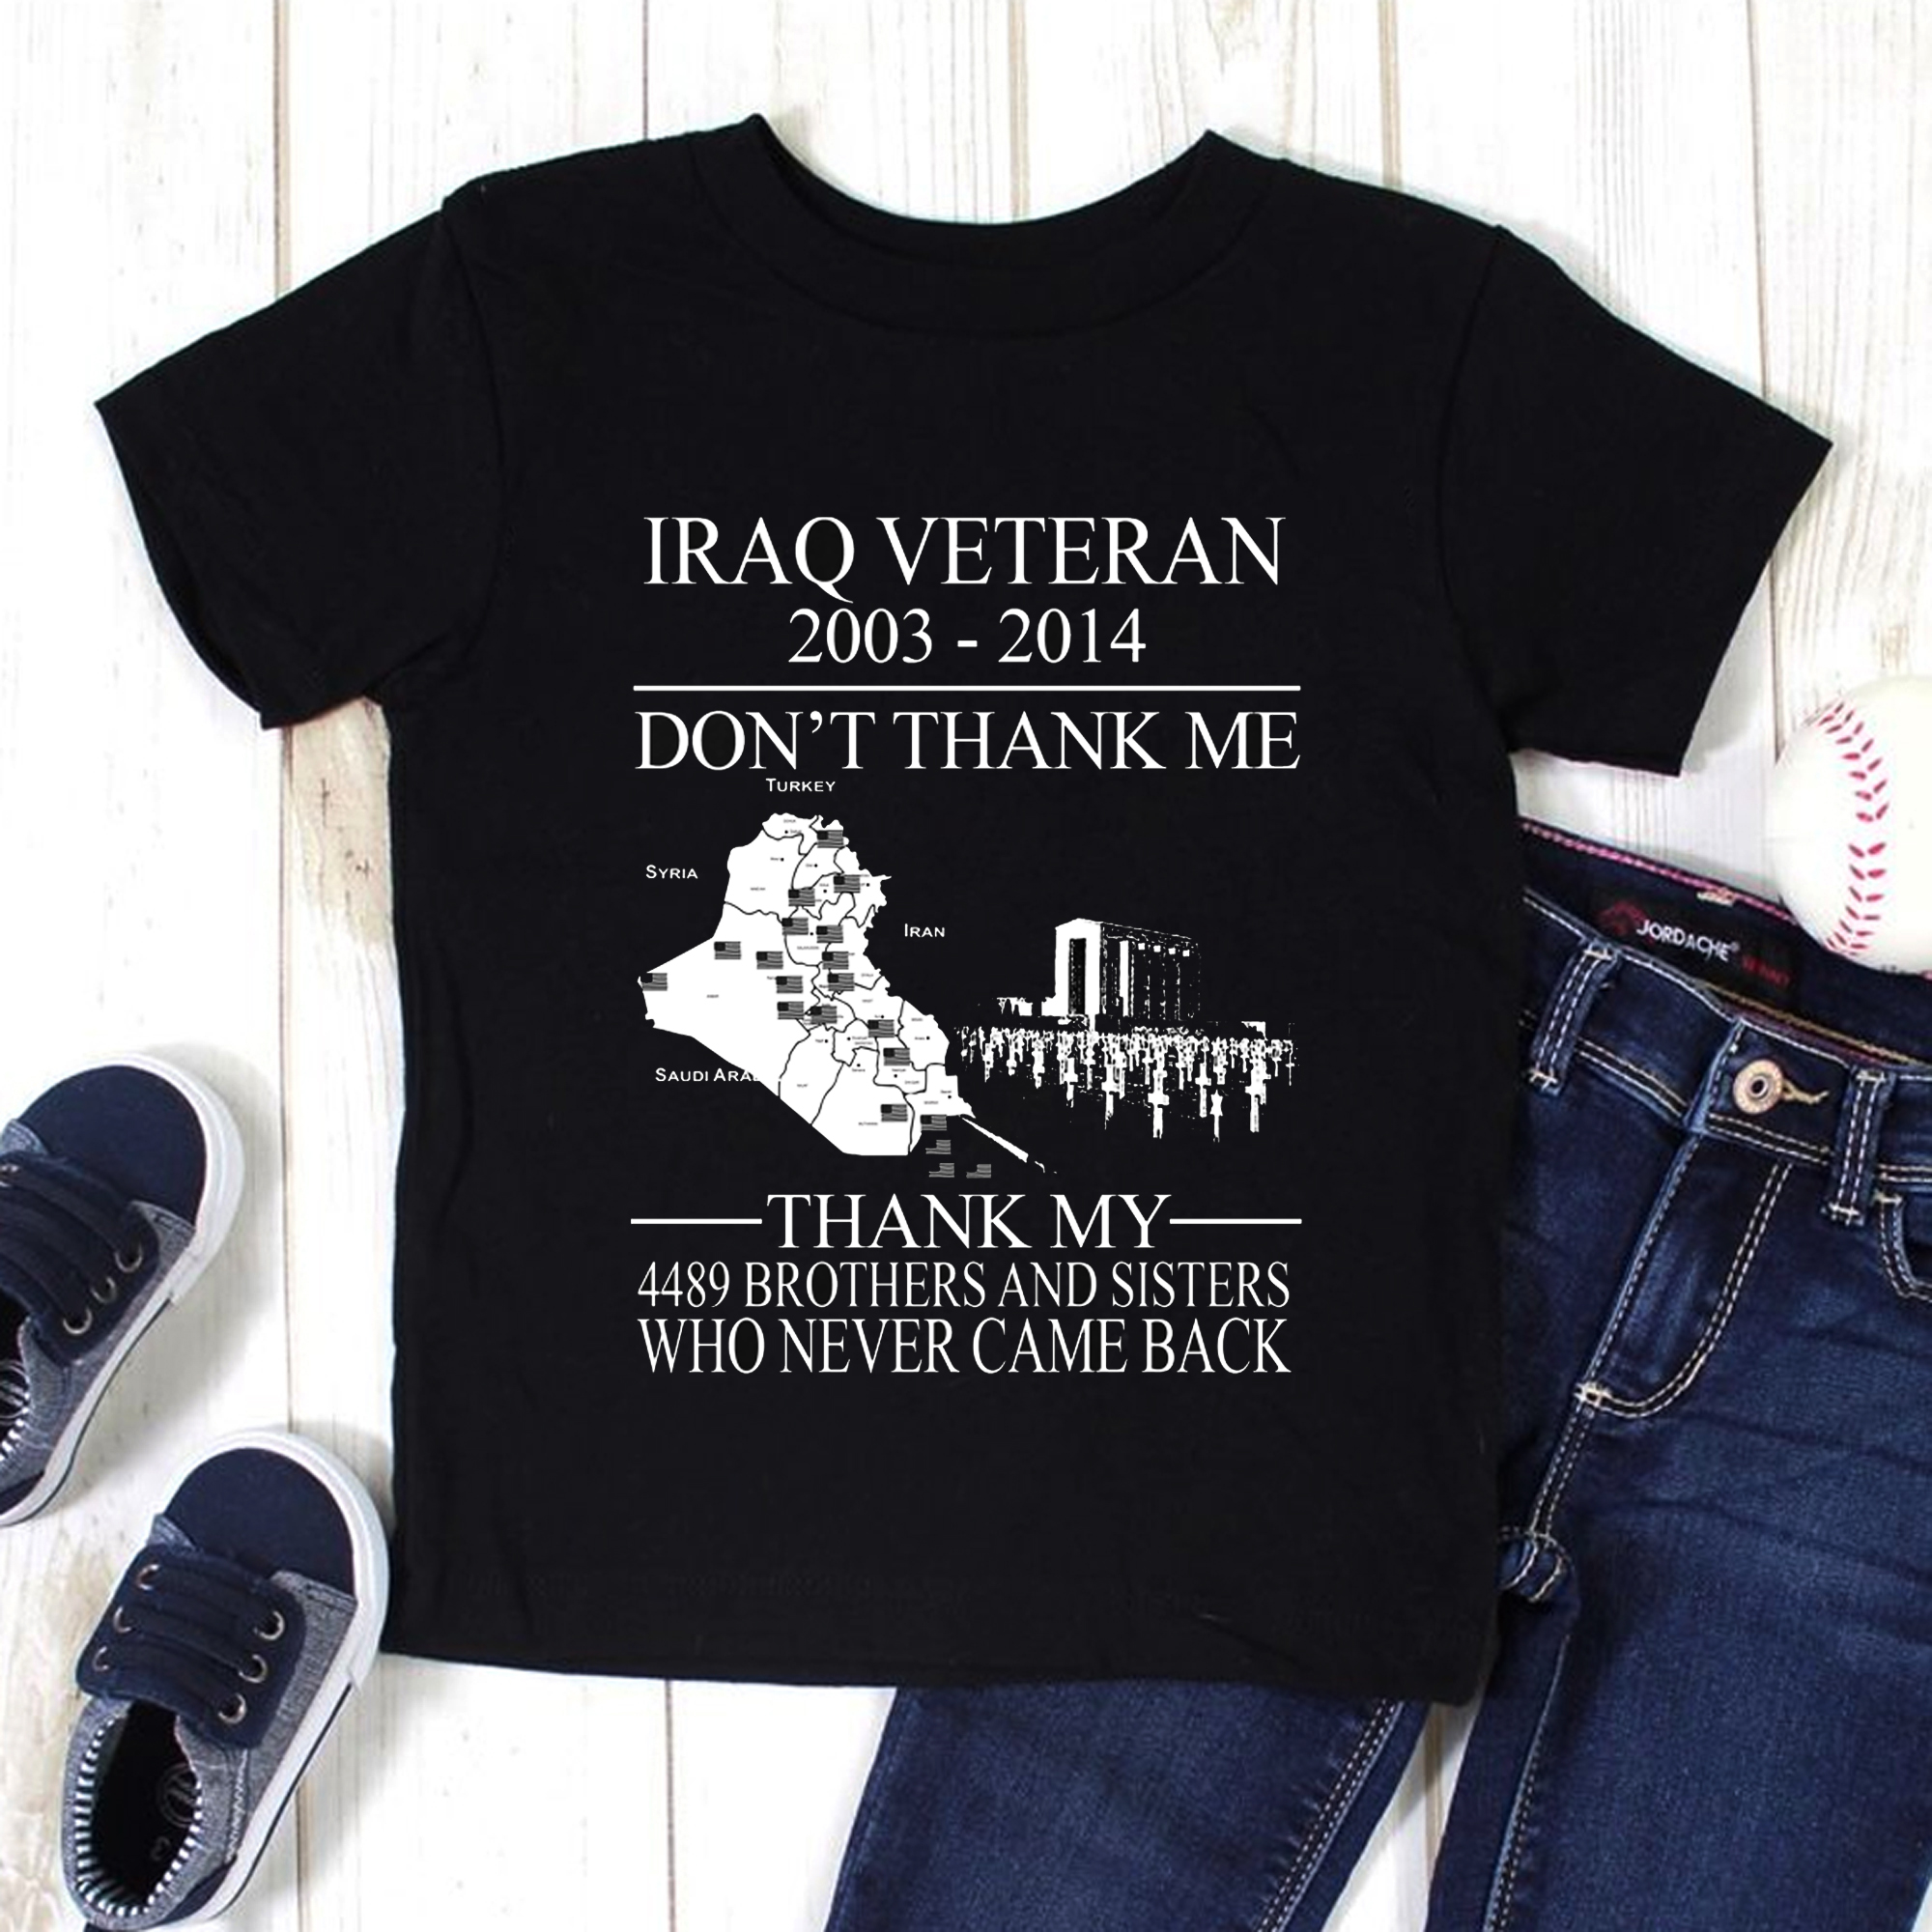 Iraq Veteran Shirt 2003-2014 Don't Thank Me